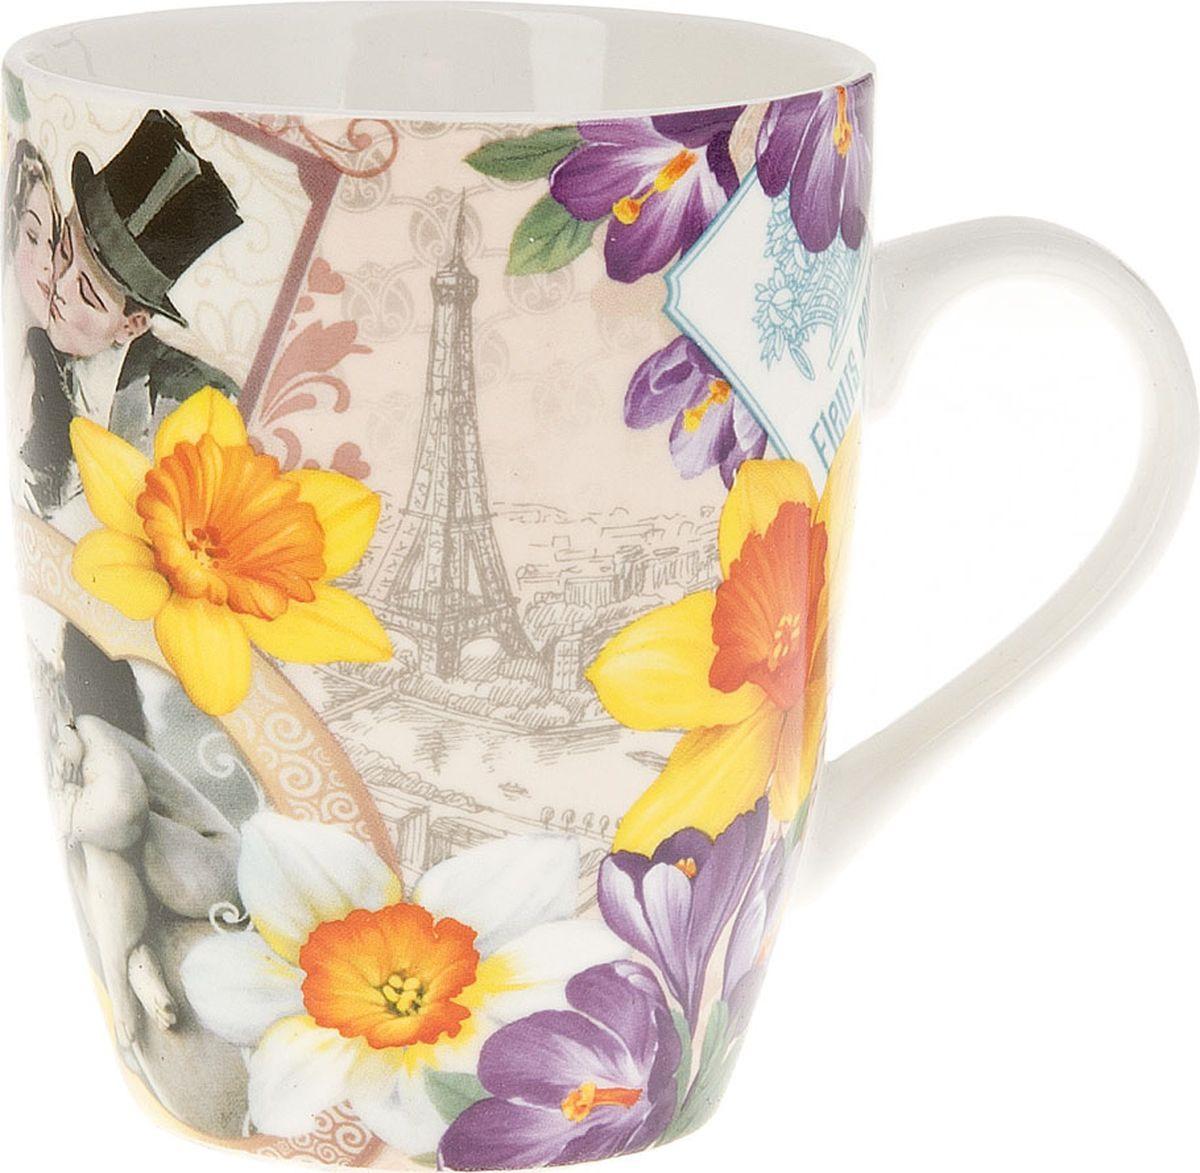 Кружка Nouvelle De France Весна в Париже, M0661028, бежевый, 320 мл кружка nouvelle de france ирис с